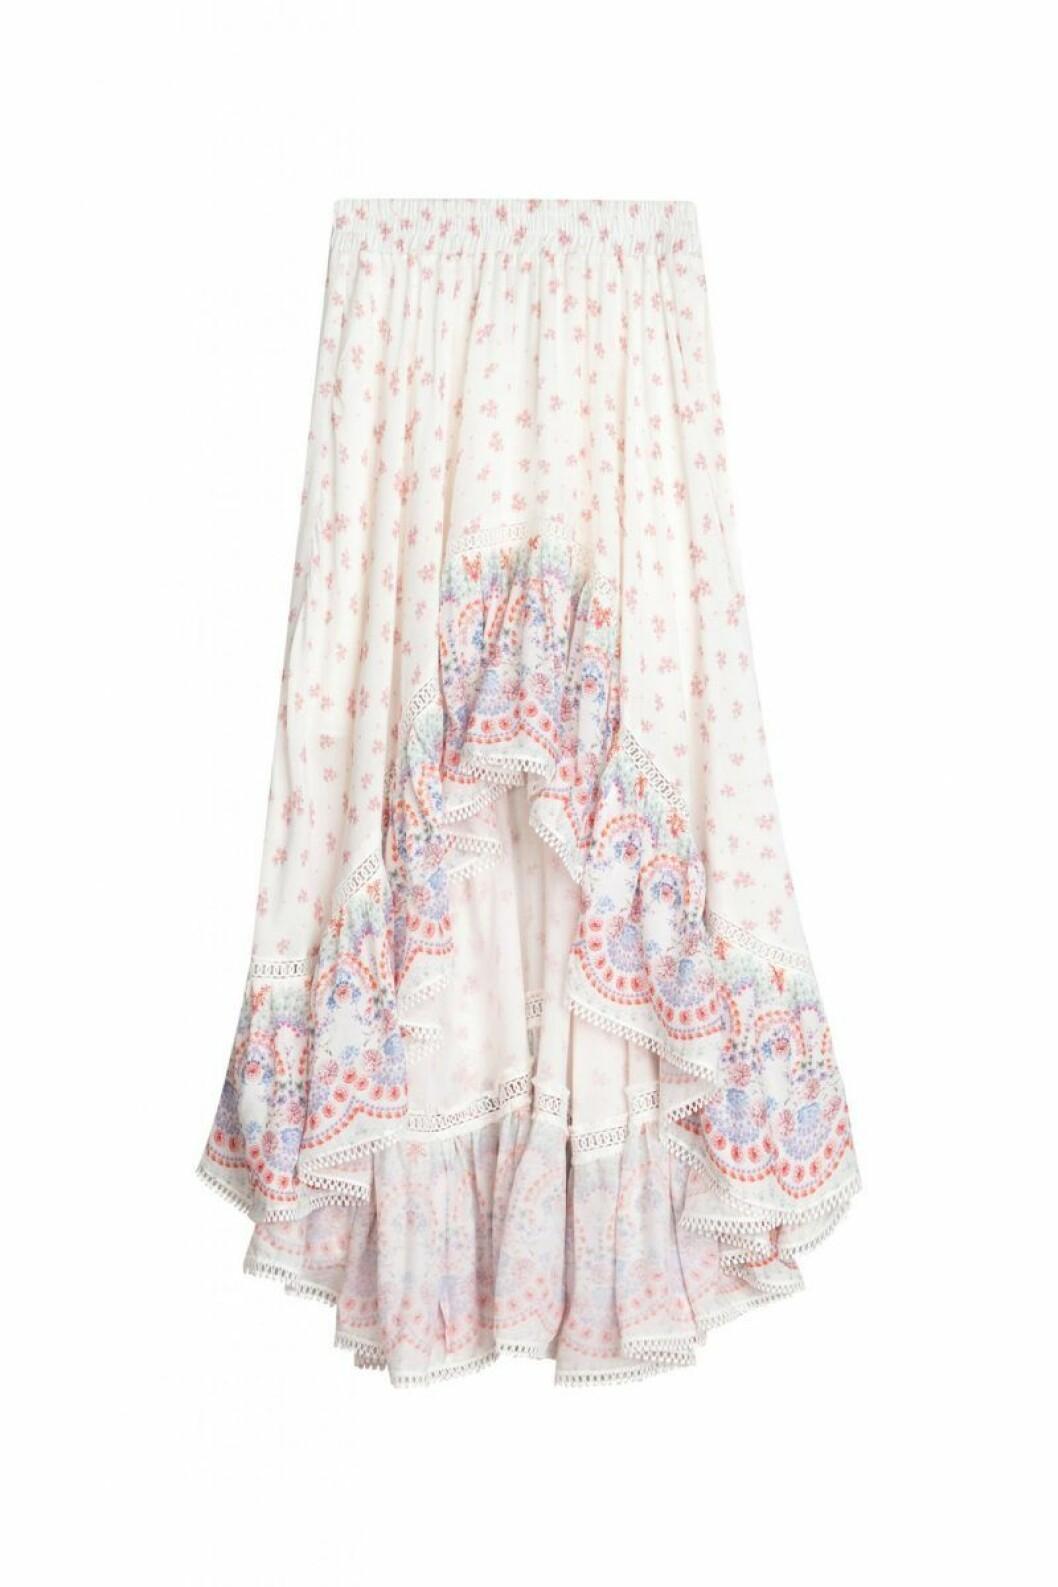 By Malinas resortkollektion 2020: Blommig kjol